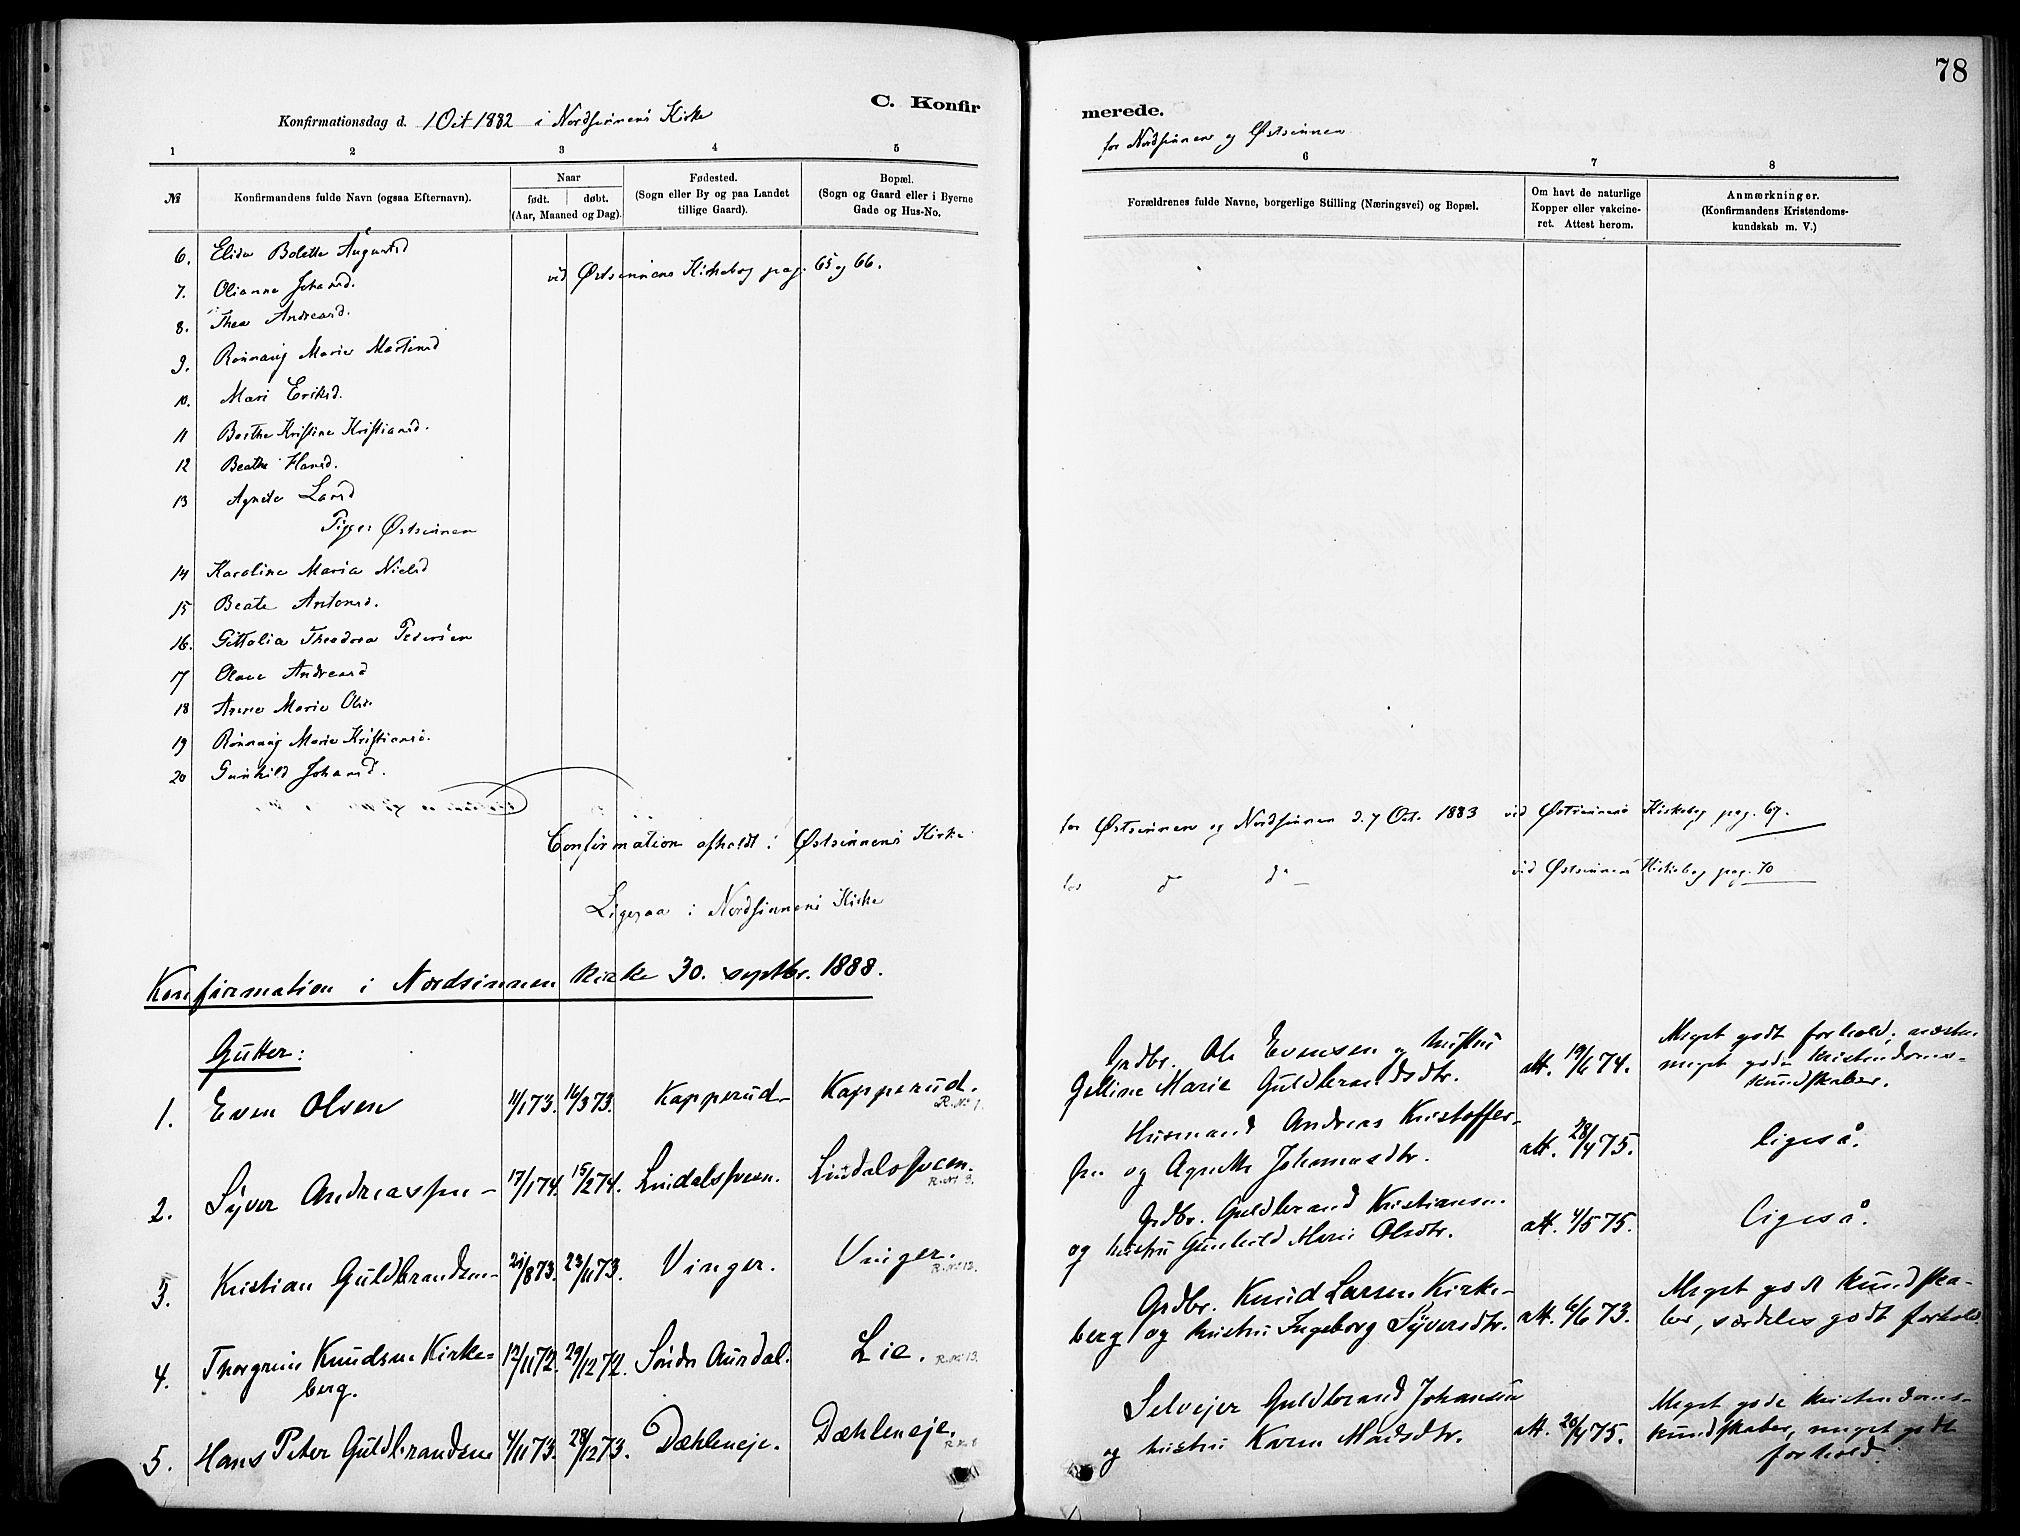 SAH, Nordre Land prestekontor, Ministerialbok nr. 5, 1882-1903, s. 78